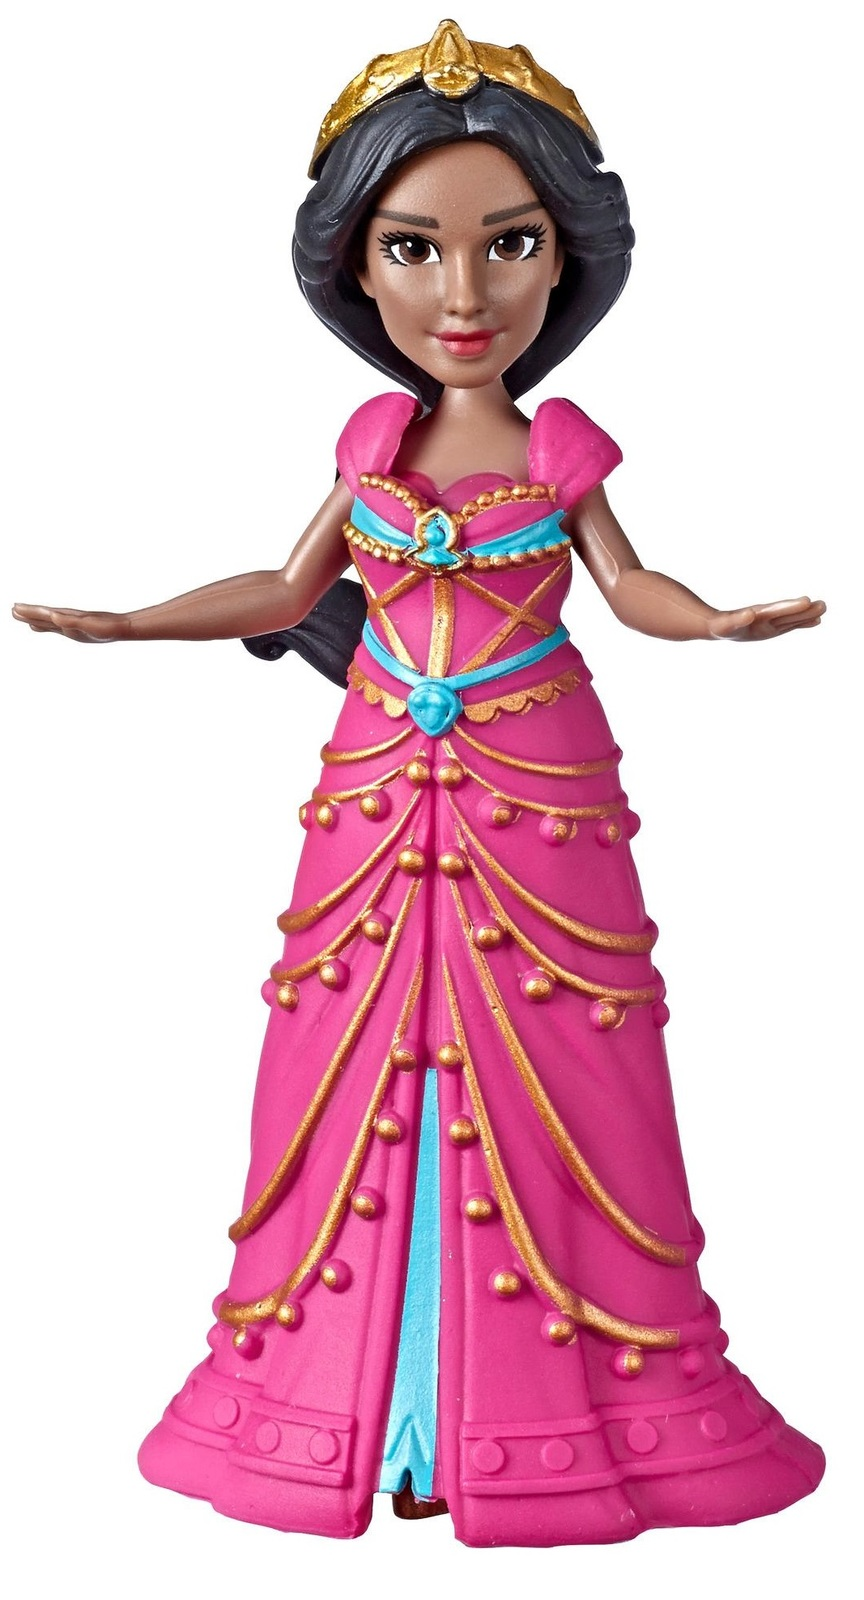 Disney's Aladdin: Small Character Doll - Jasmine (Pink Dress) image